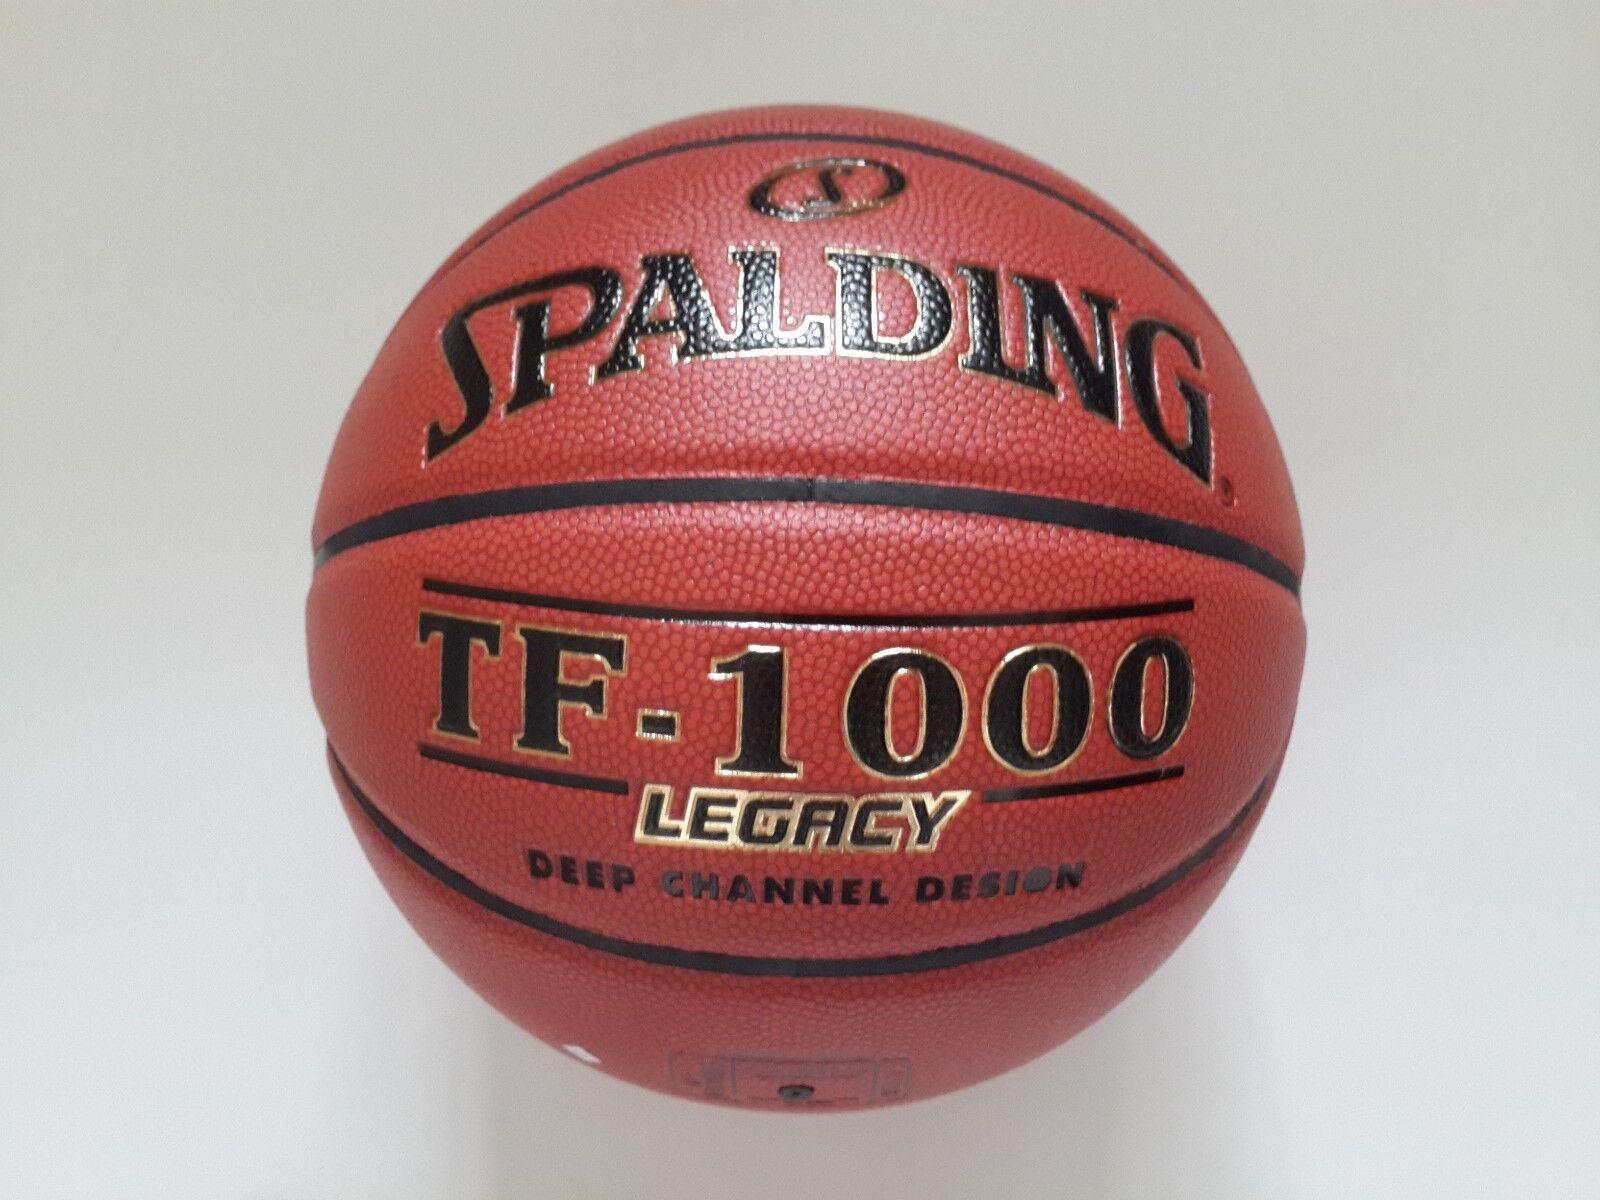 Spalding TF-1000 Legacy Basketball Ball FIBA 74-450Z Indoor Gameball Size 7